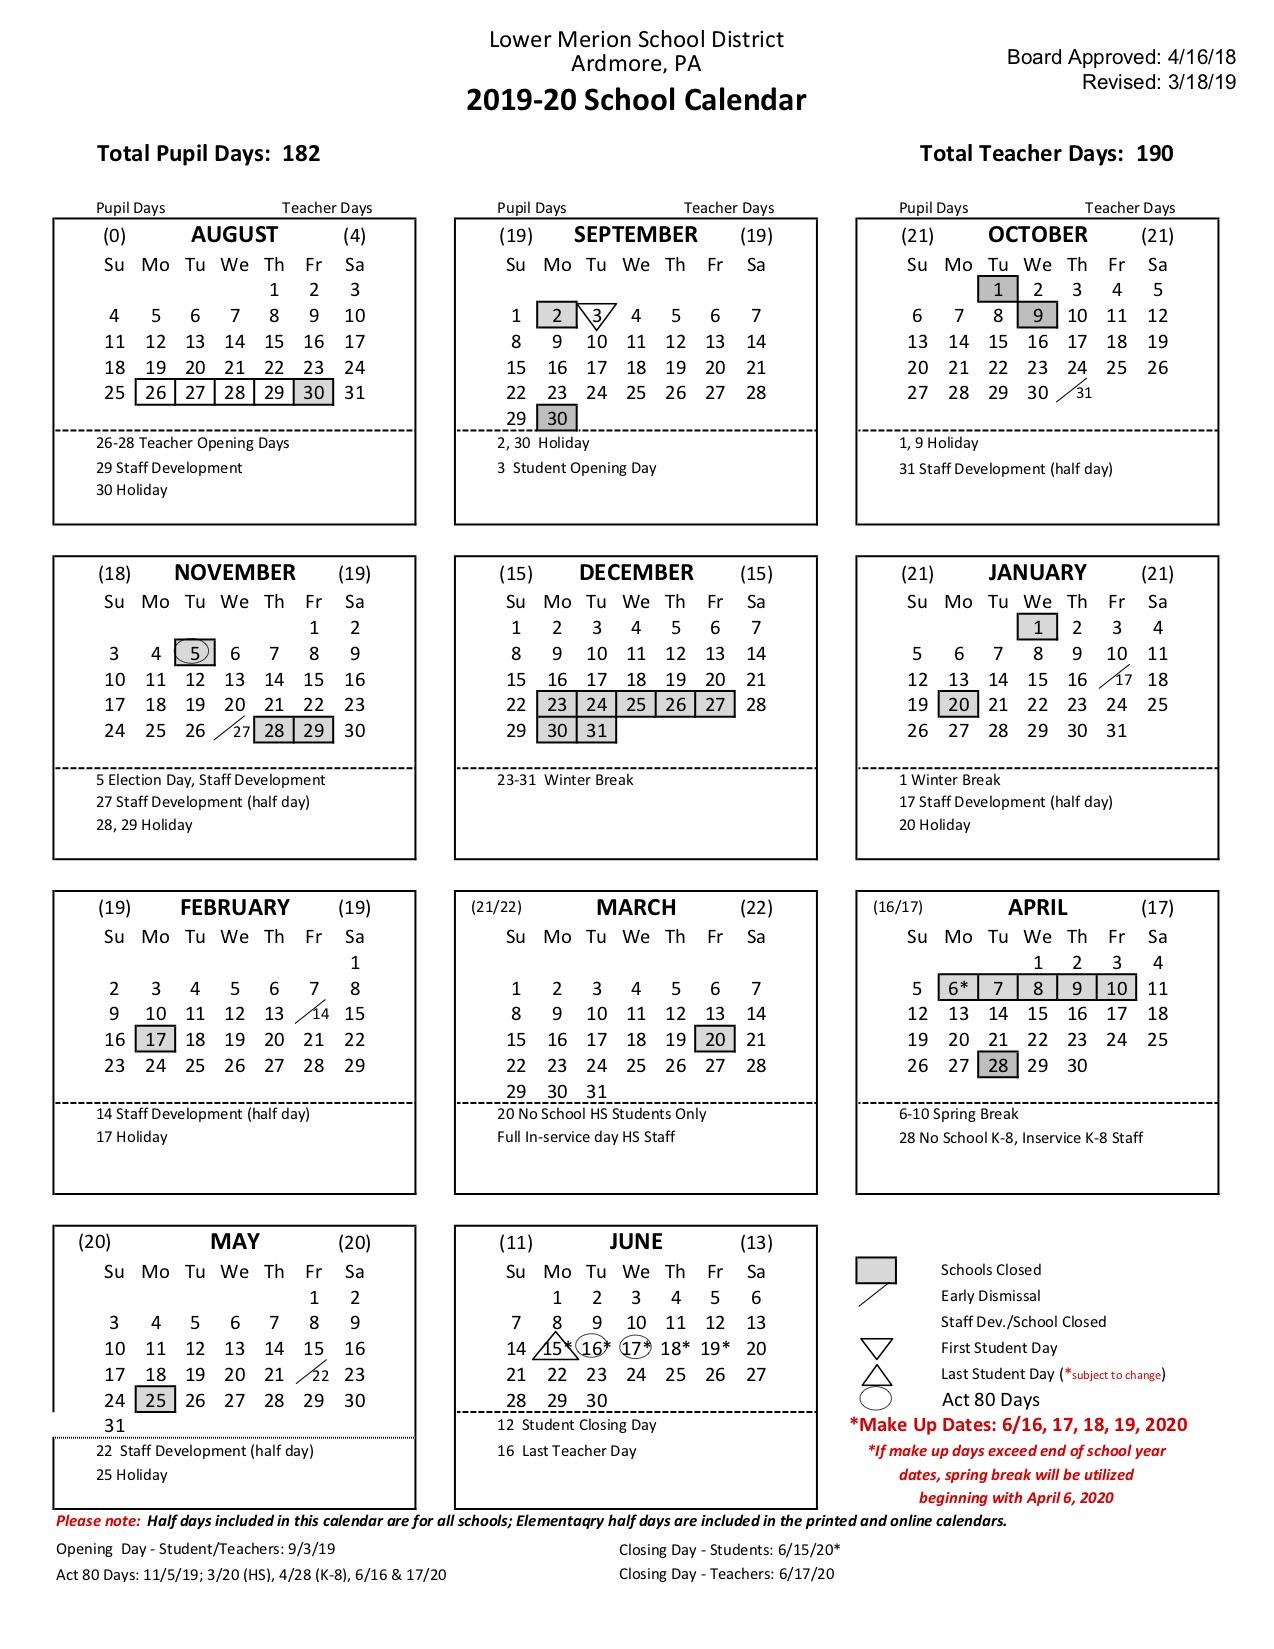 Colonial School District Calendar